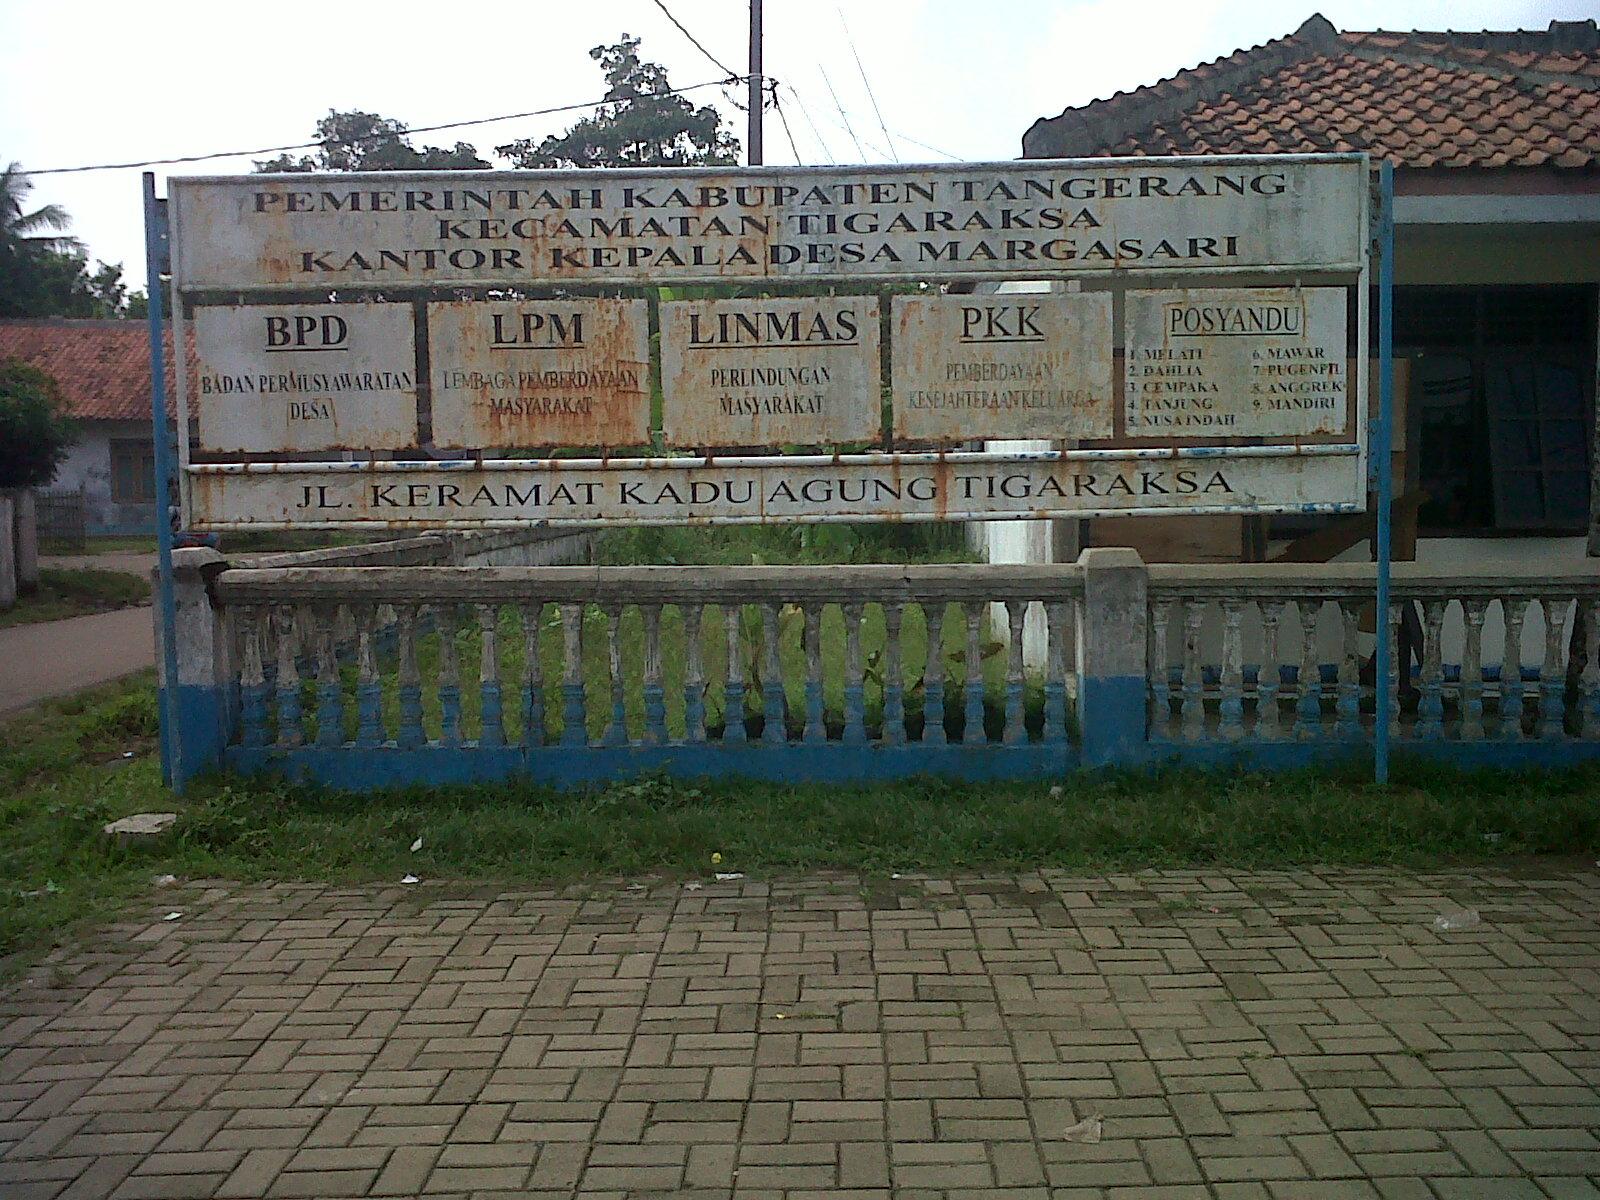 Tigaraksa Desa Margasari